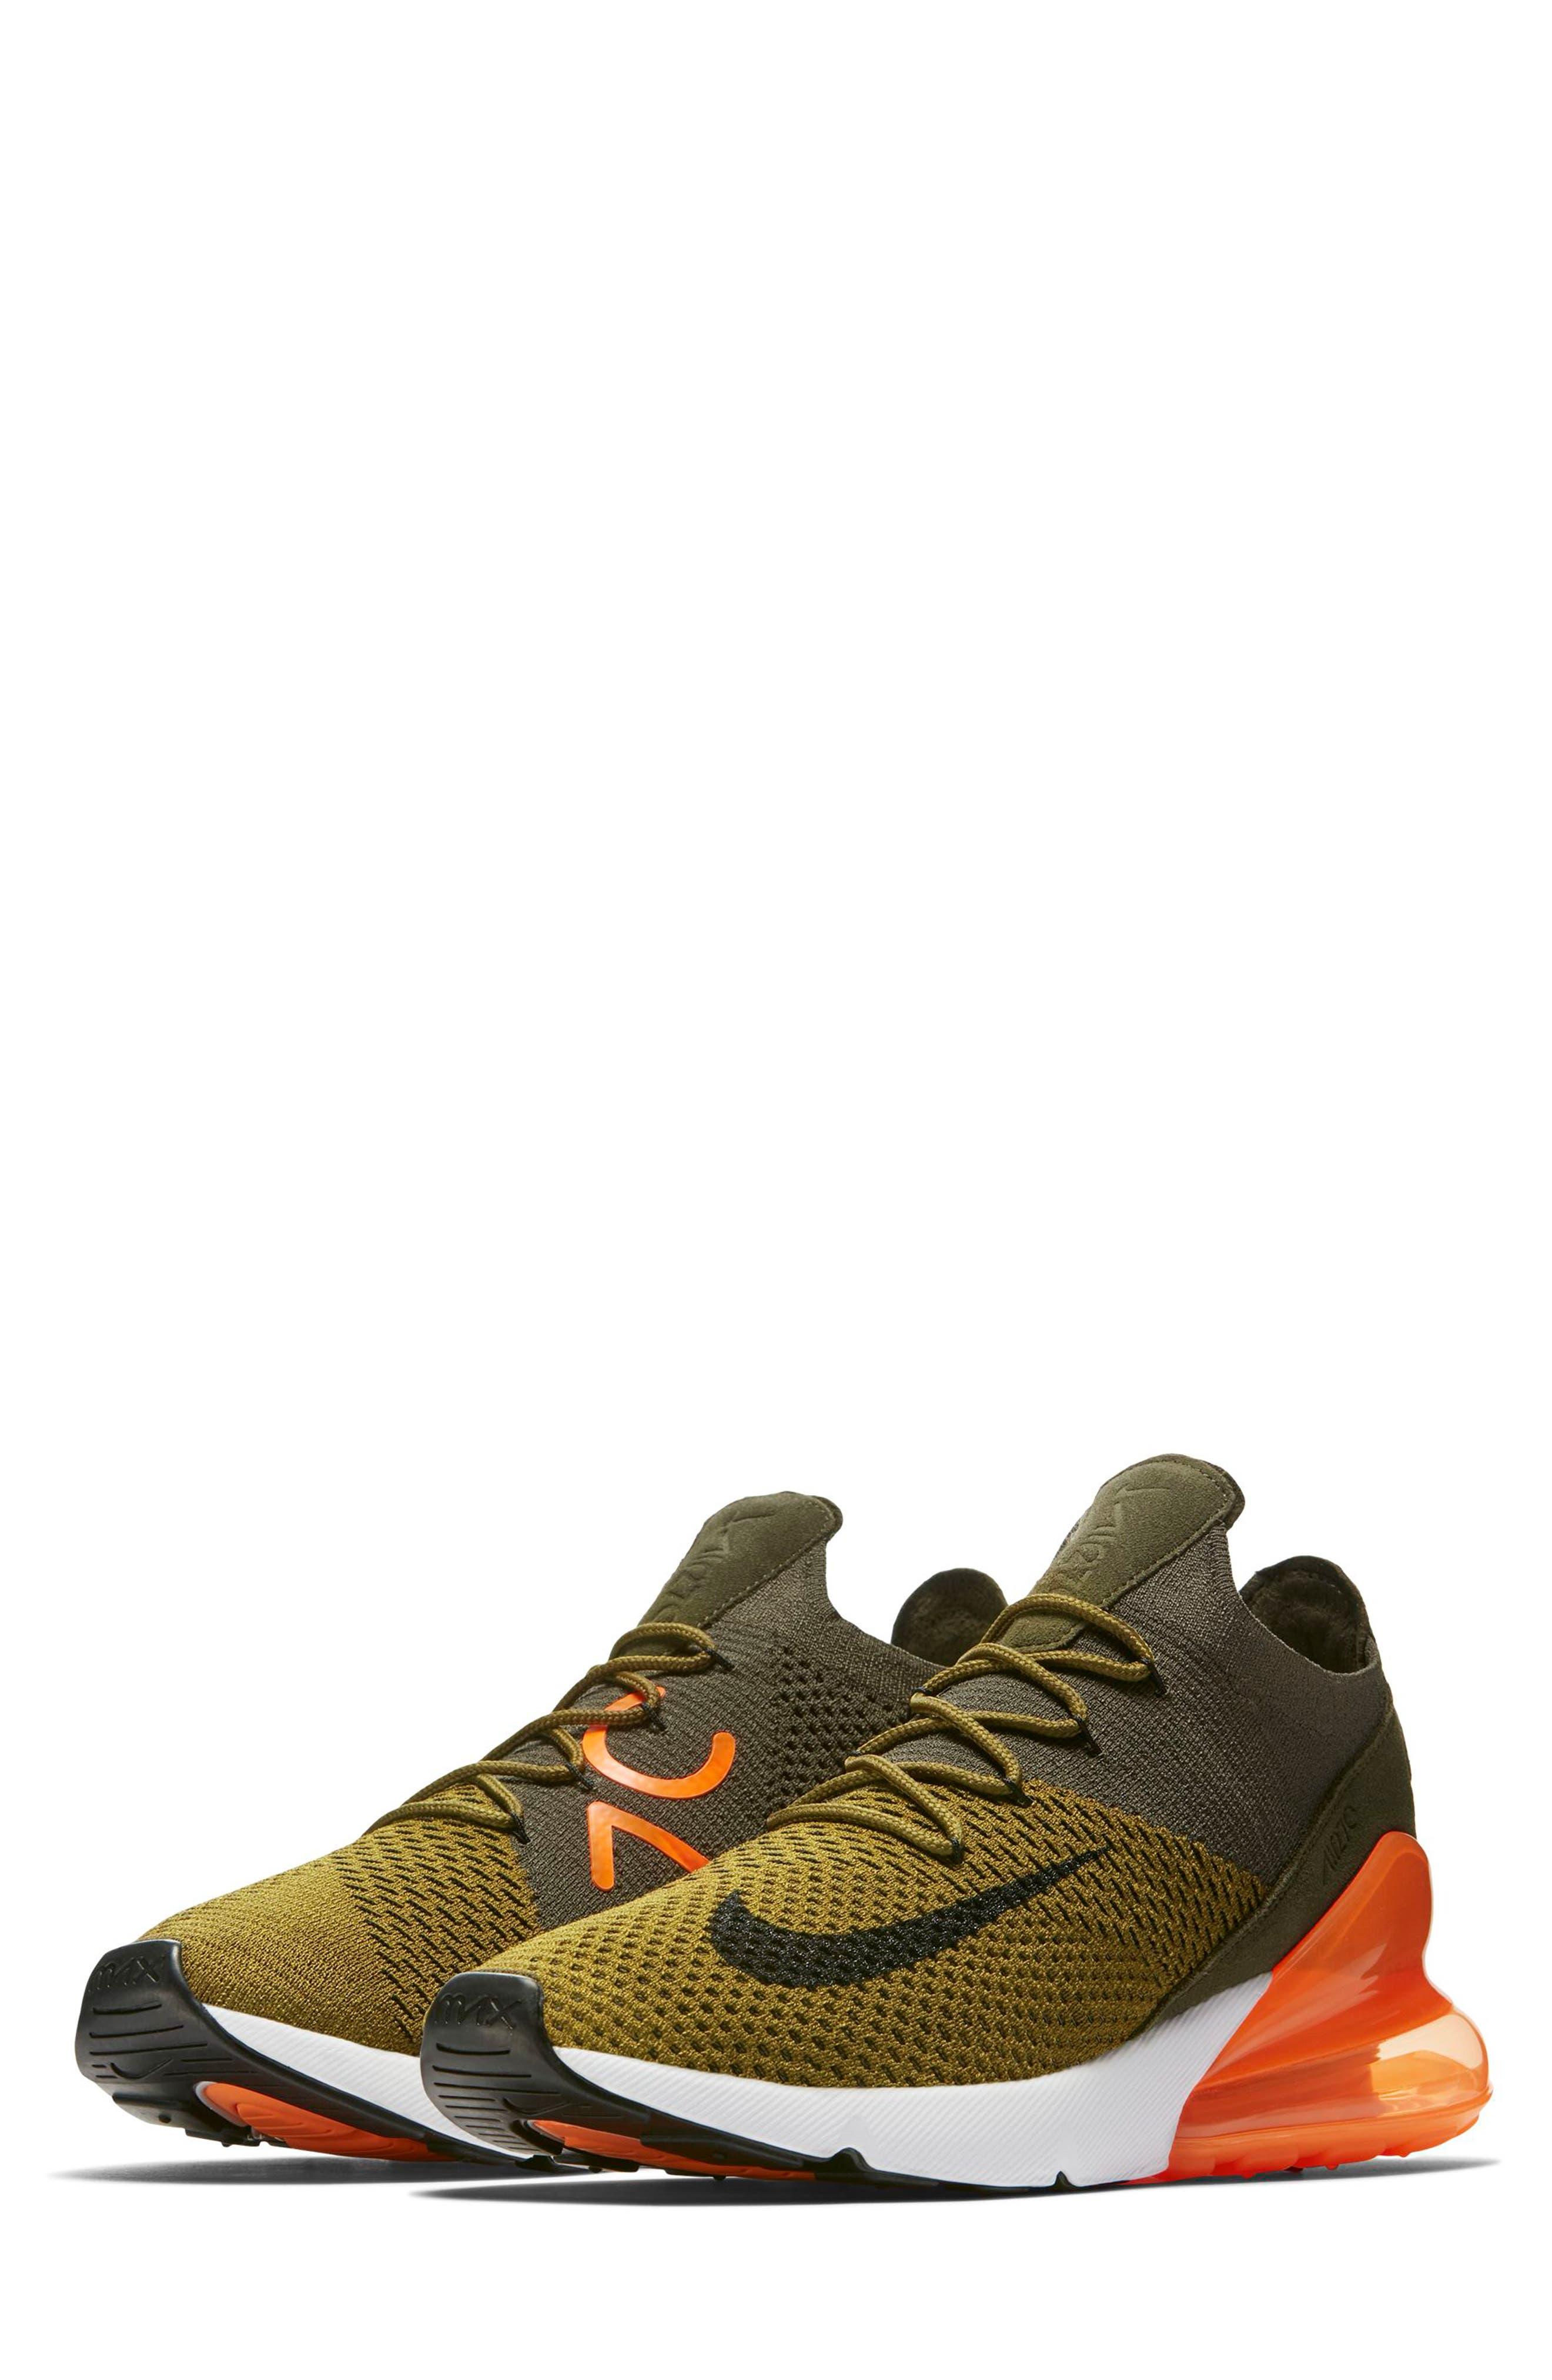 Air Max 270 Flyknit Sneaker,                             Main thumbnail 1, color,                             OLIVE/ BLACK/ CARGO KHAKI